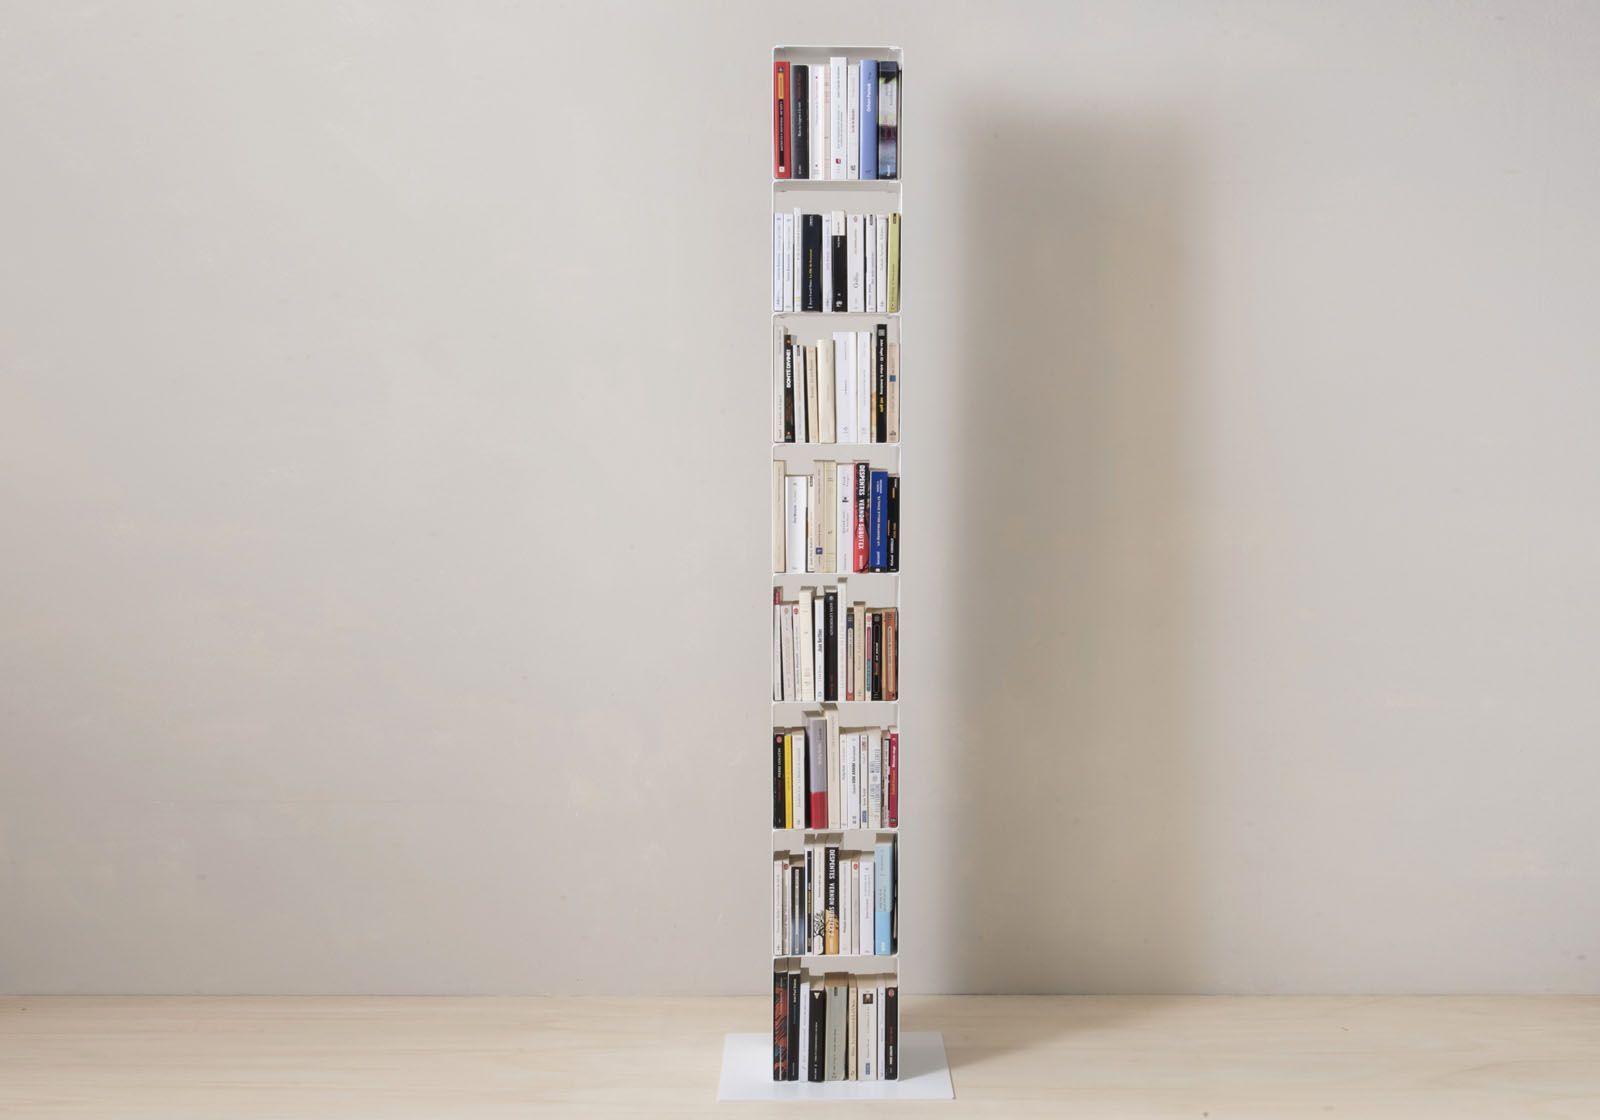 Cube storage shelves - 8 shelves